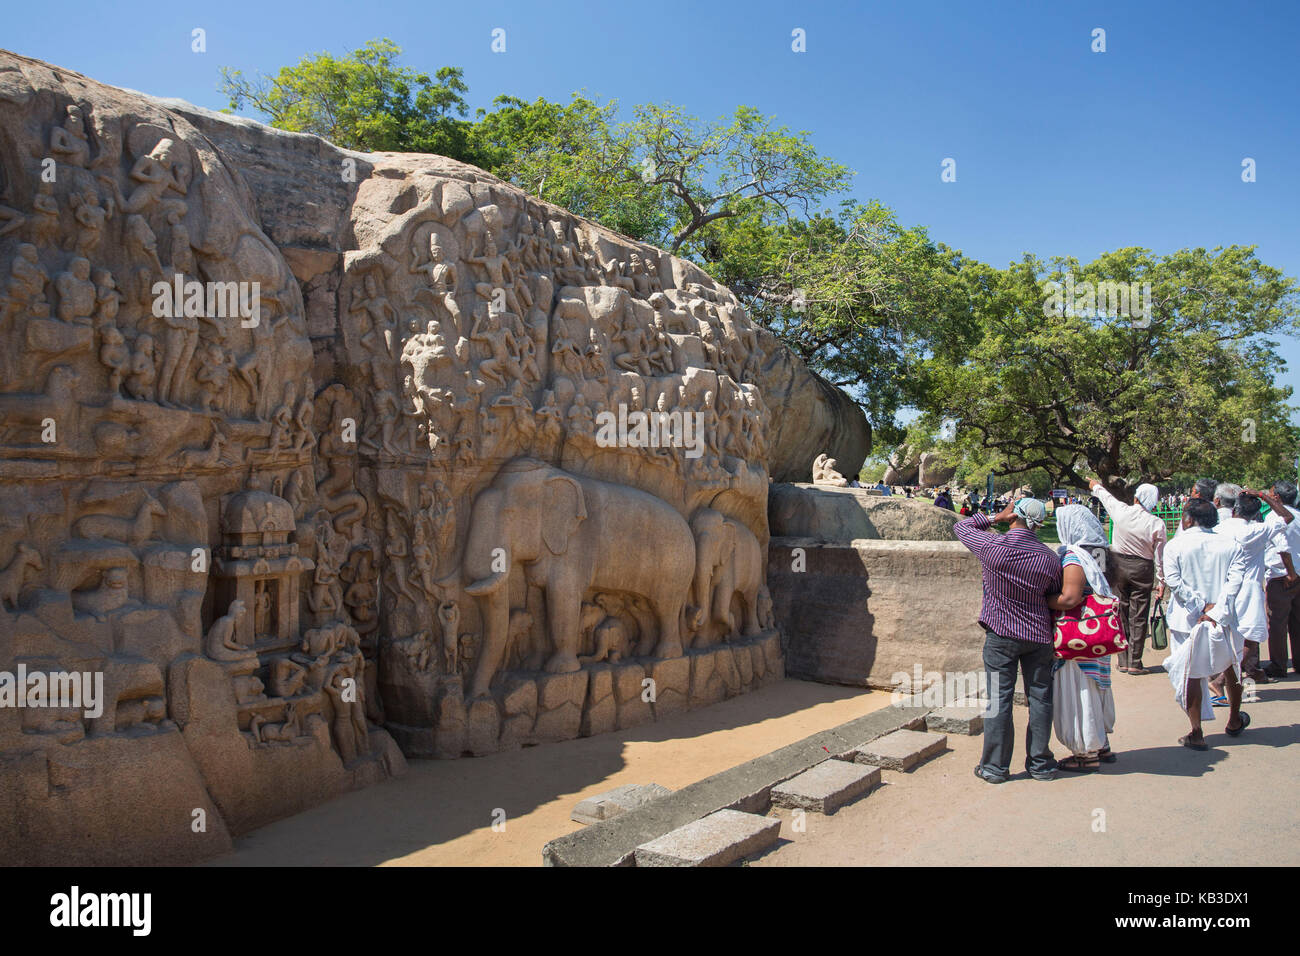 India, Tamil Nadu, Mamallapuram, penalty of the Arjuna, rock art, bas-relief - Stock Image